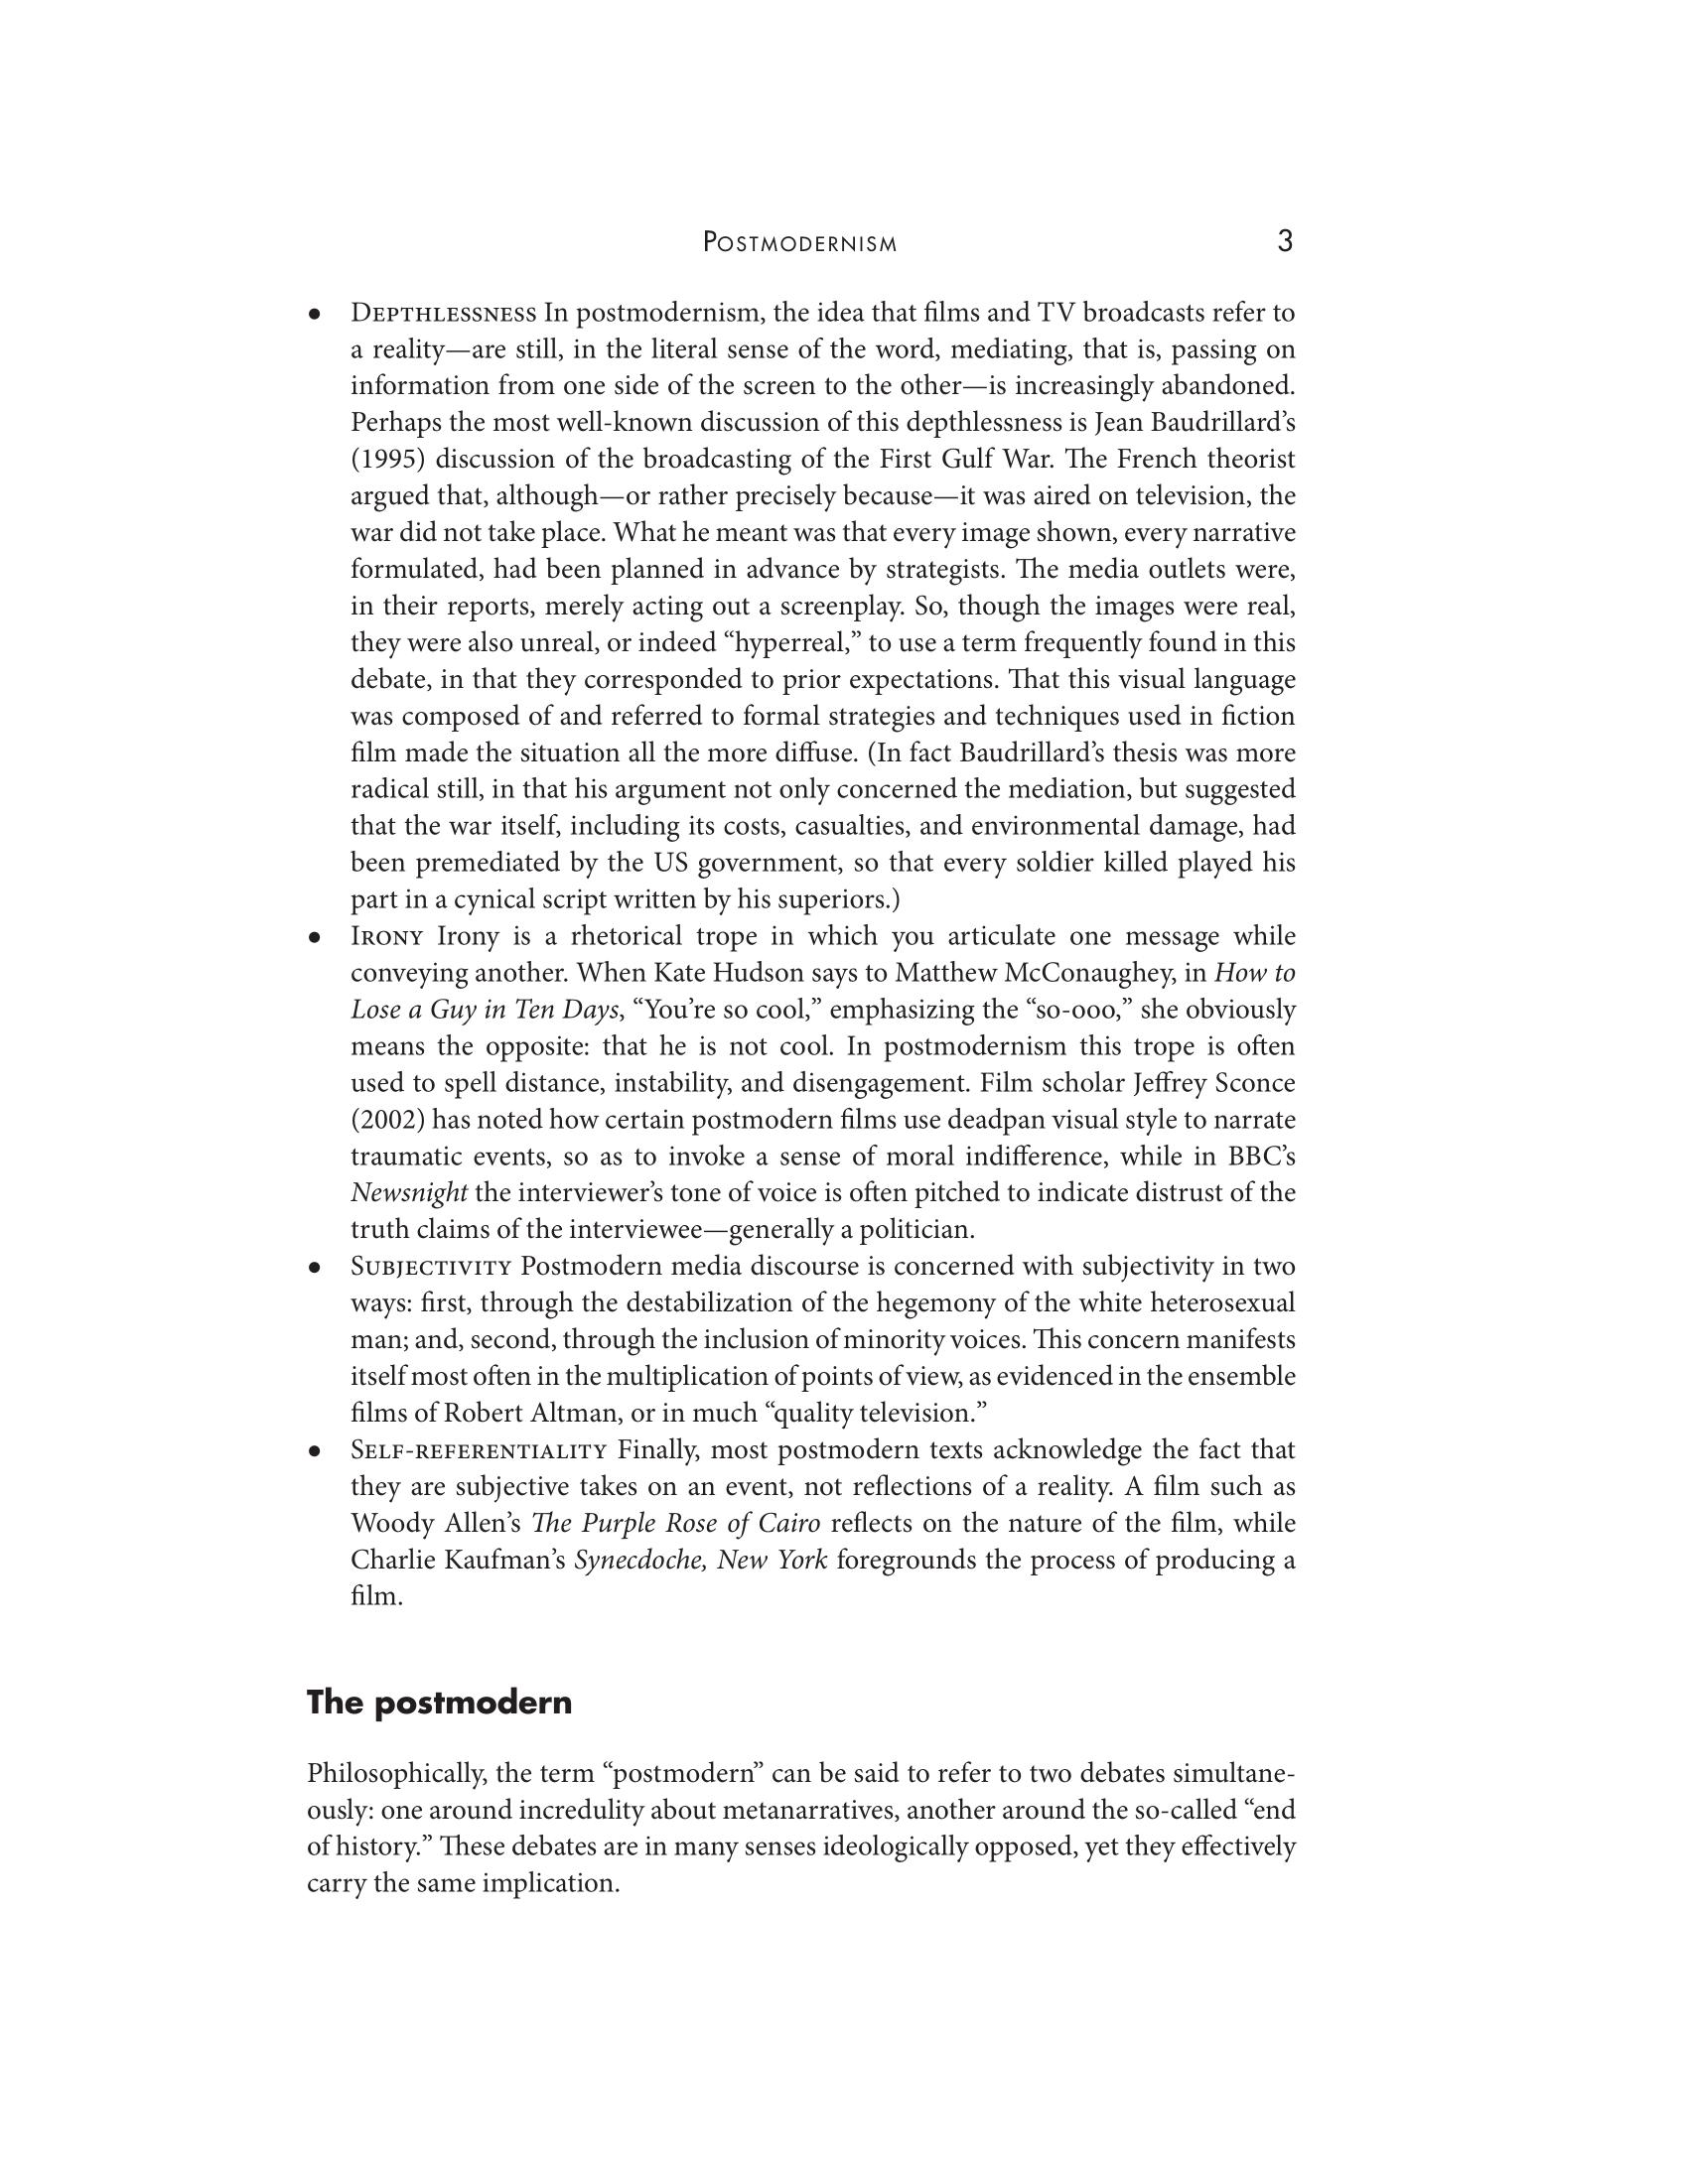 Postmodernism-3.png